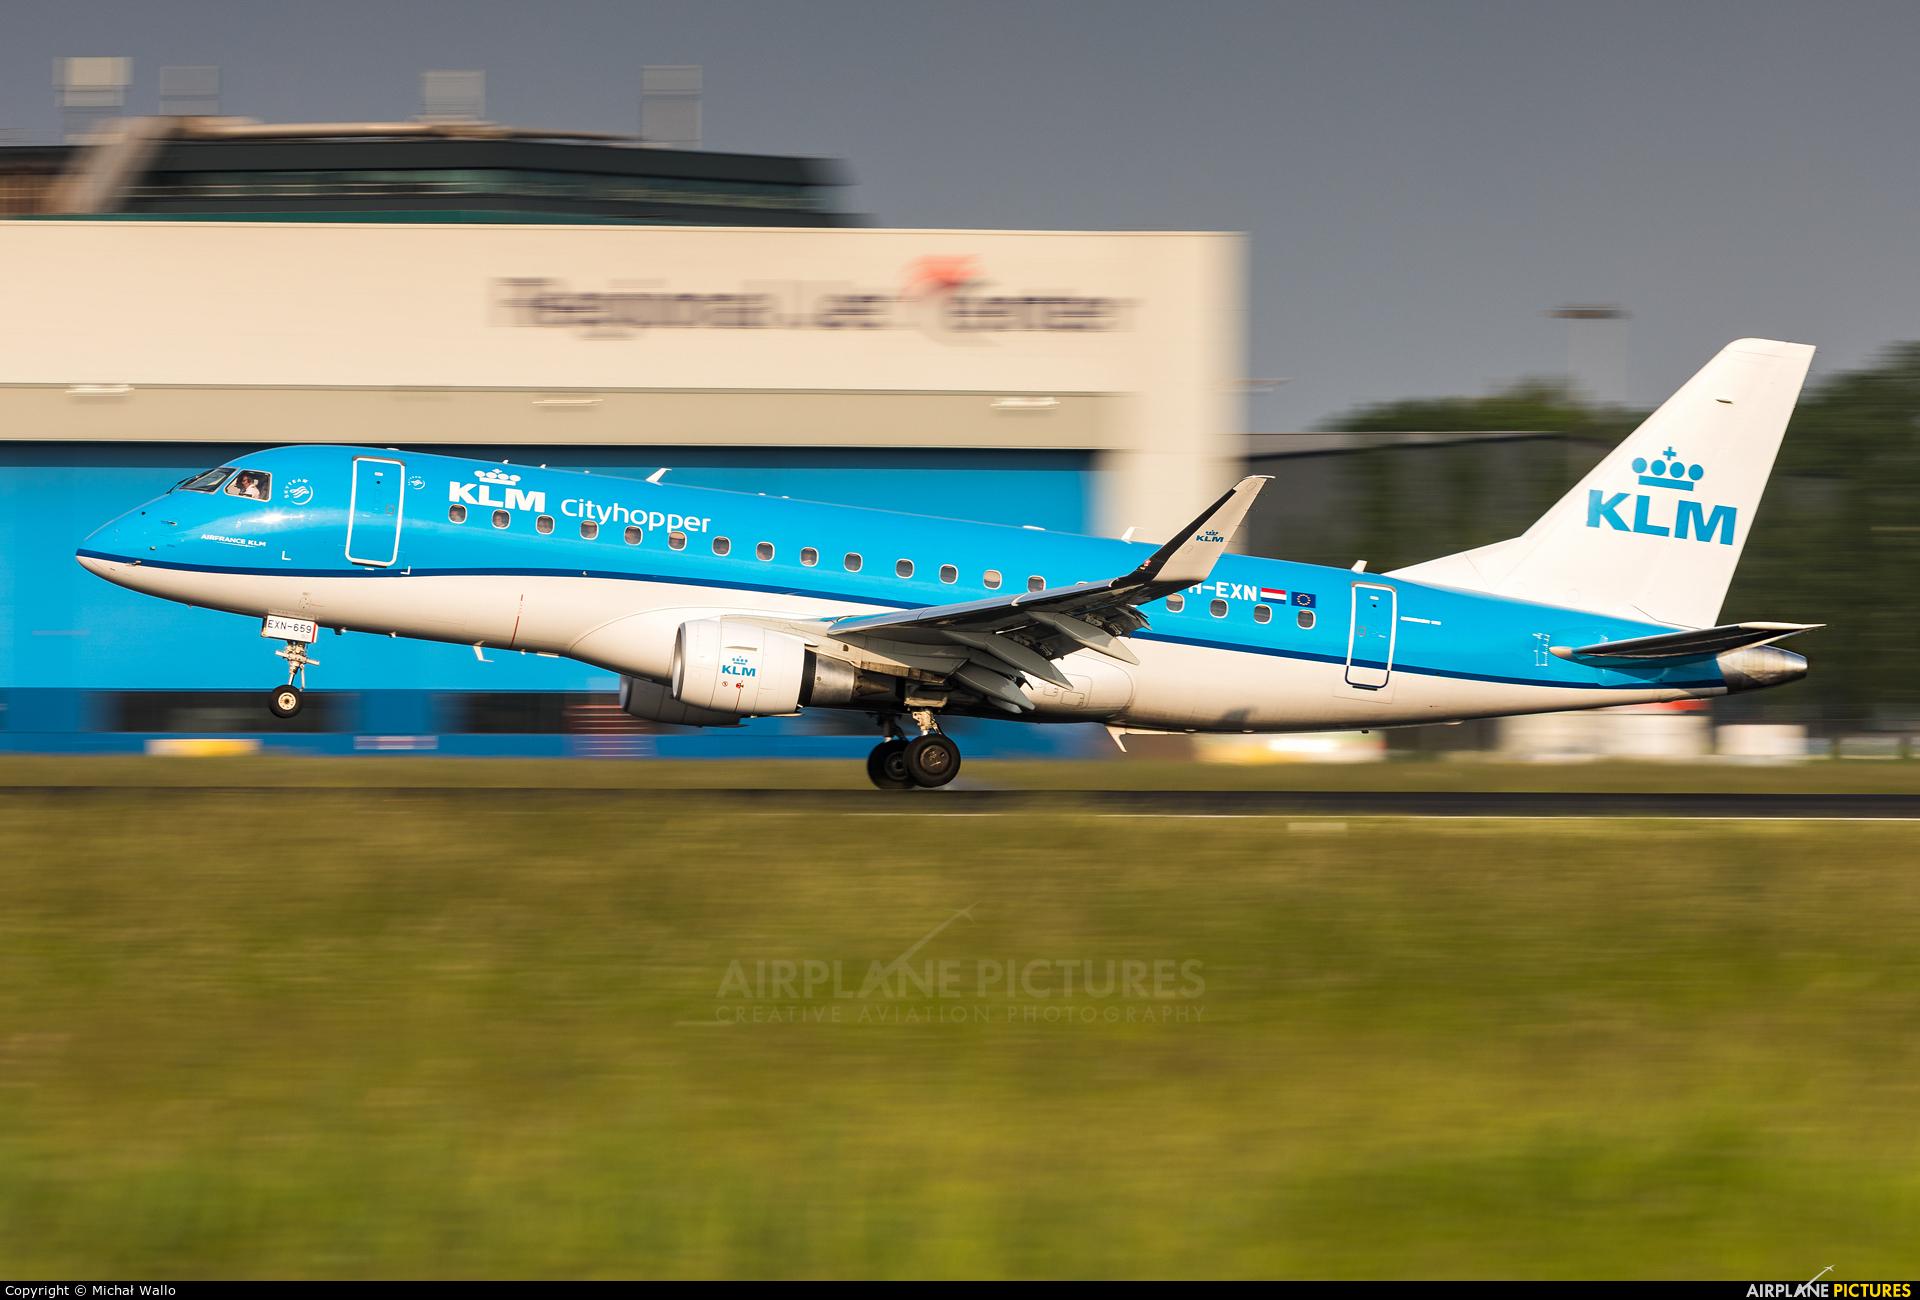 KLM Cityhopper PH-EXN aircraft at Amsterdam - Schiphol